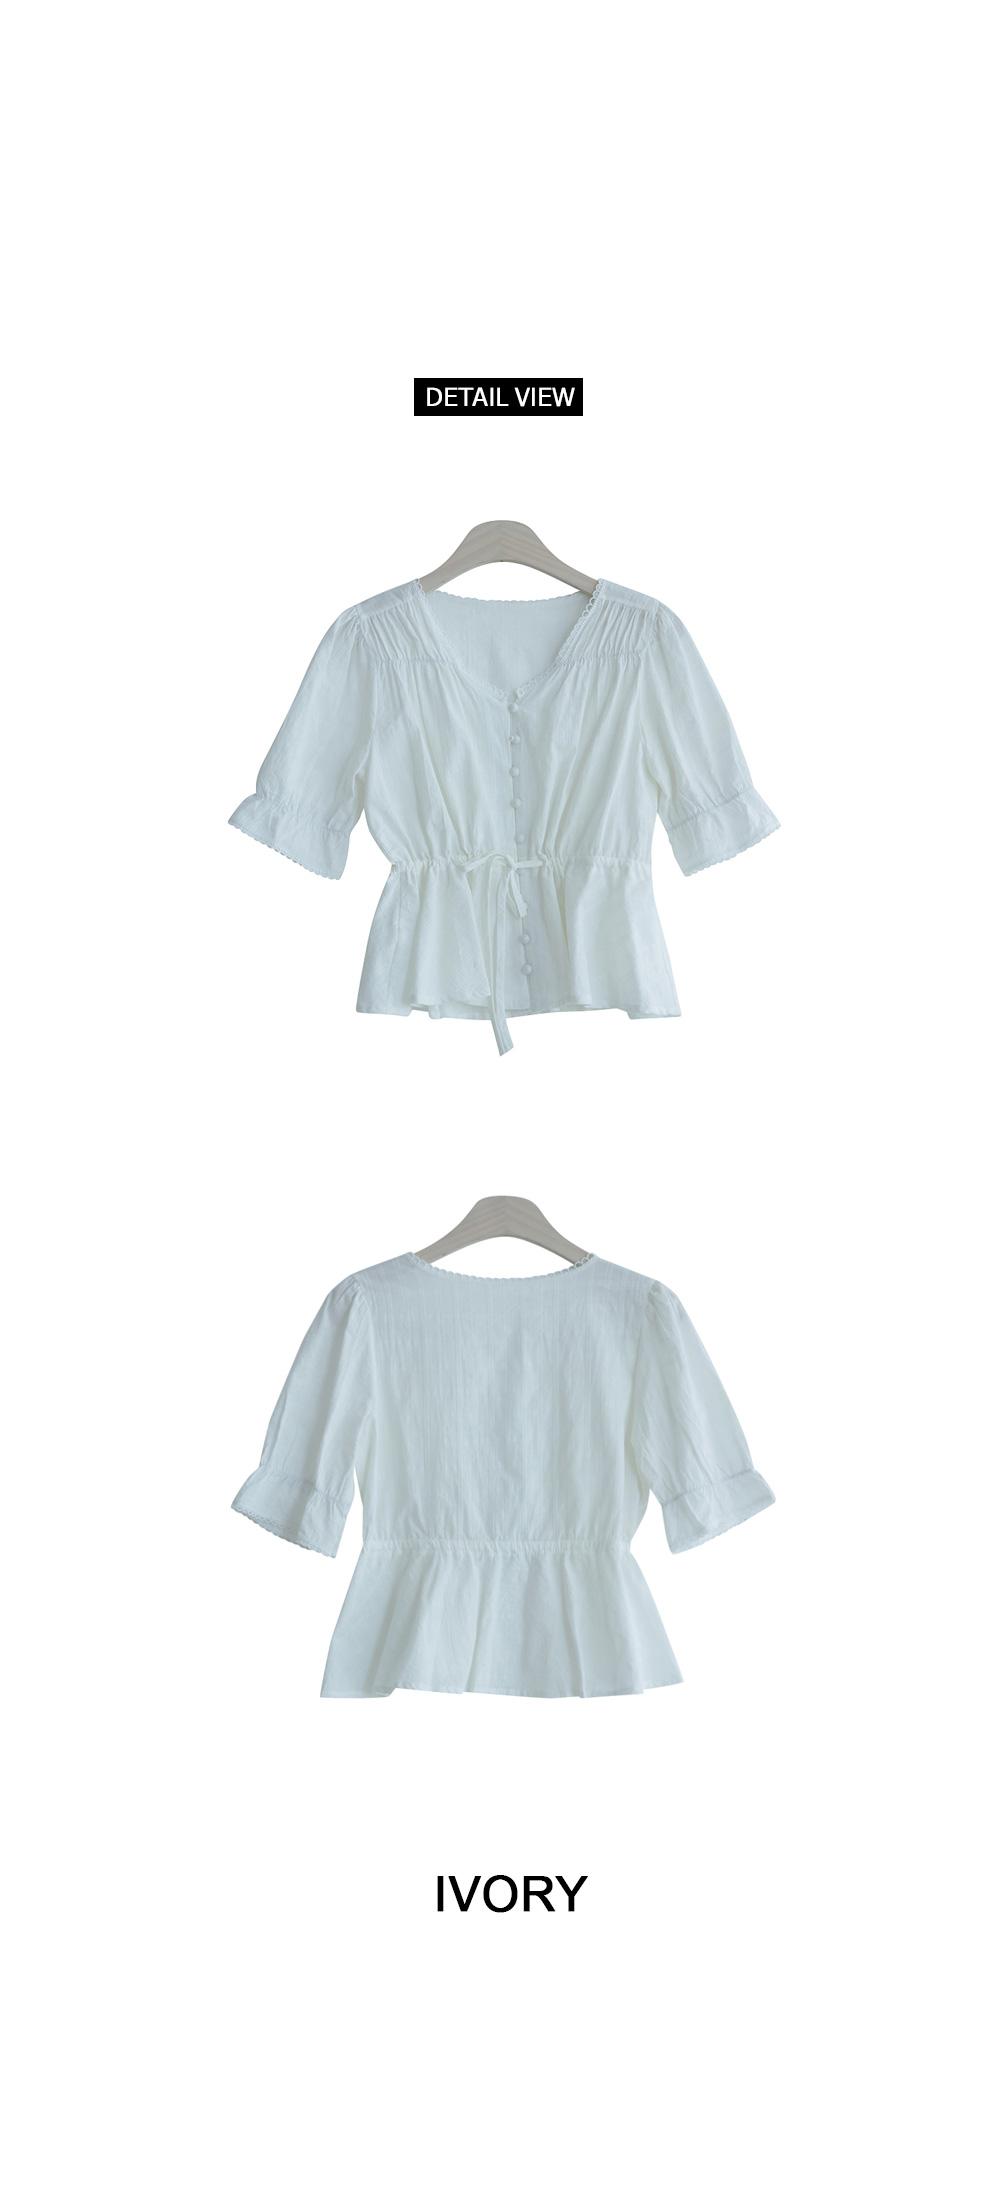 Blythe summer blouse